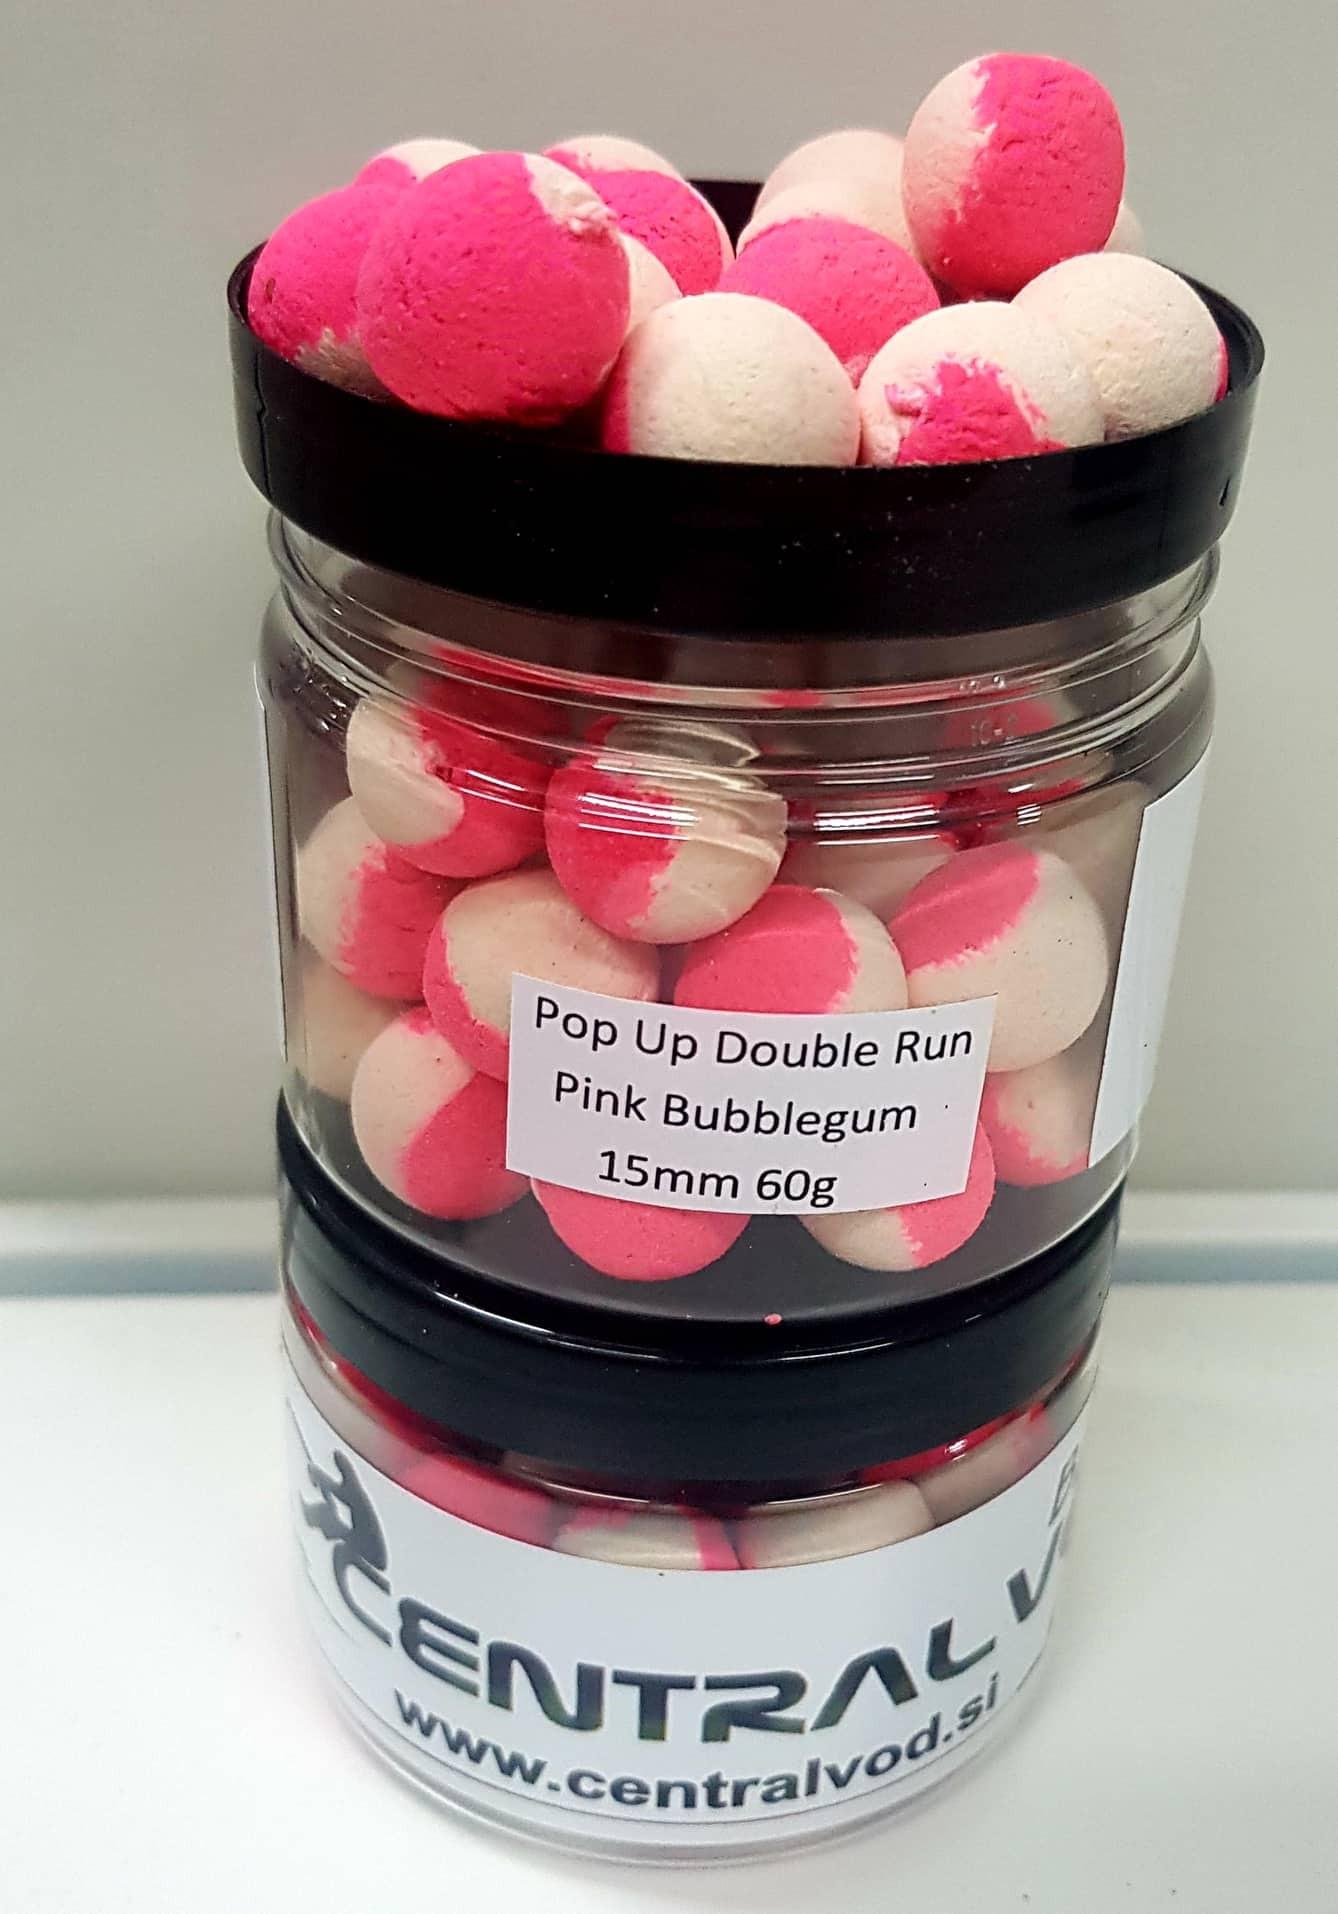 Pop Up Centralvod Baits Double Run Pink Bubblegum 15mm 60g